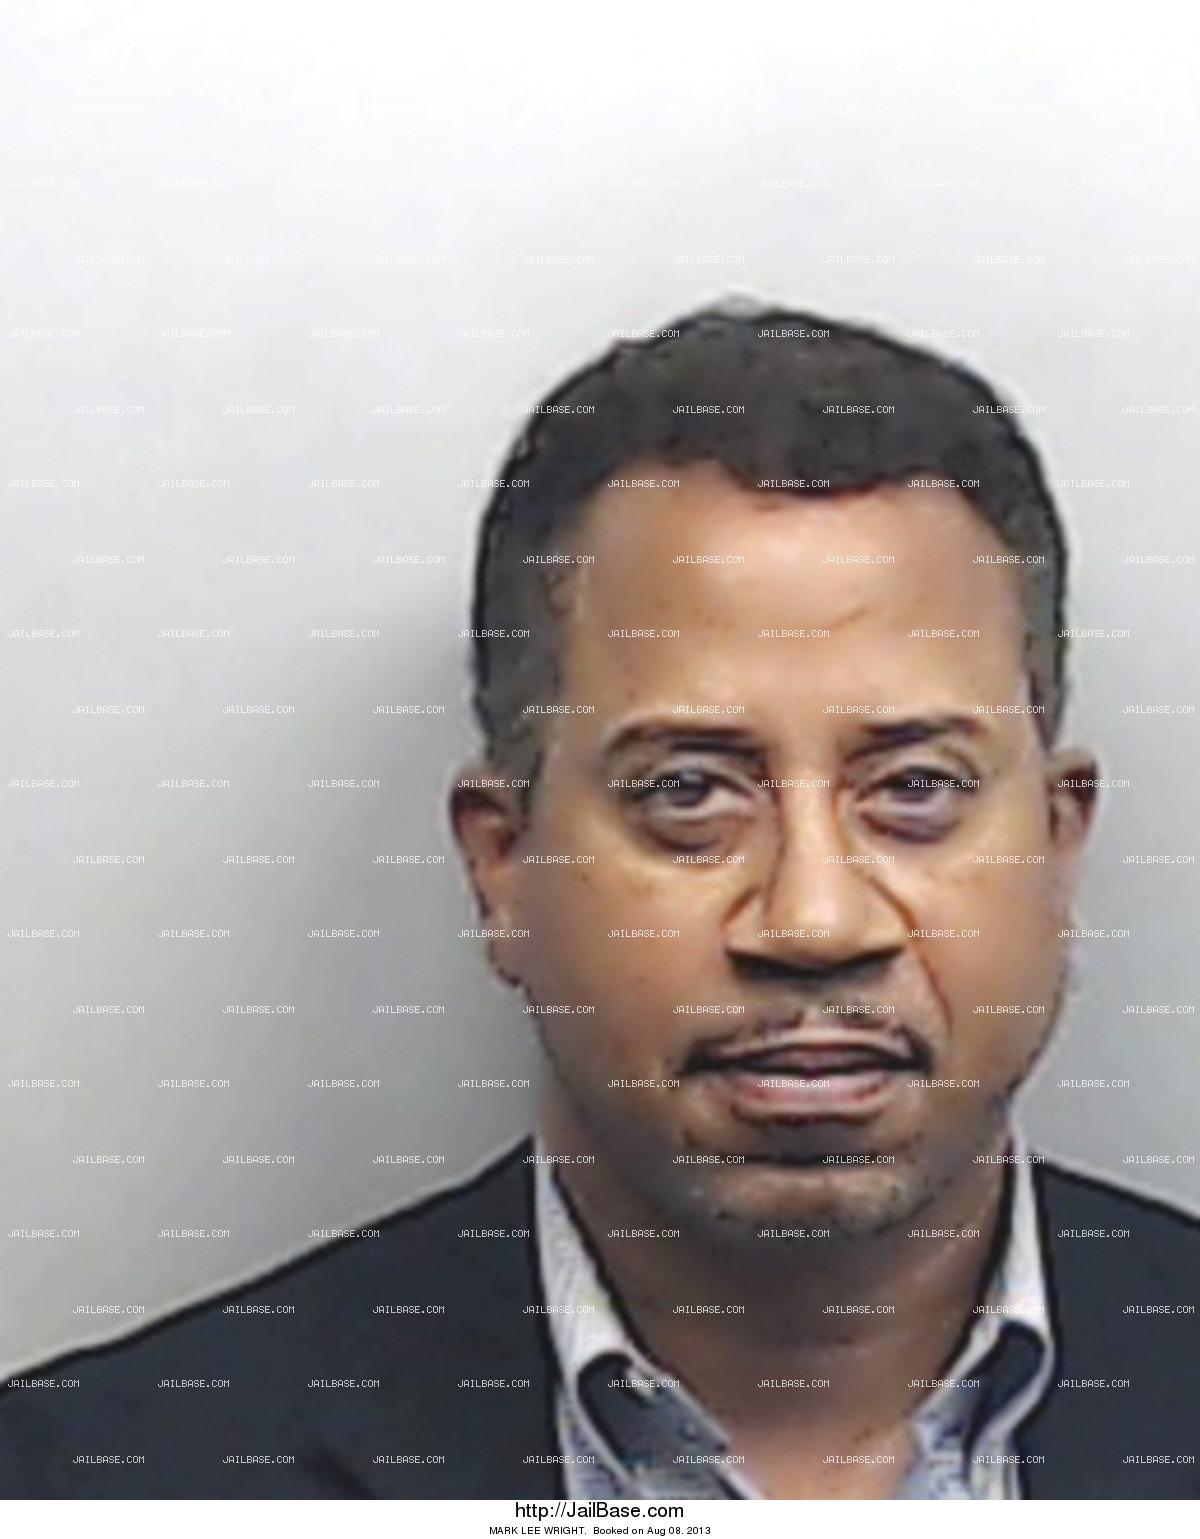 Mark Lee Wright Booked On Aug 08 2013 Jailbase